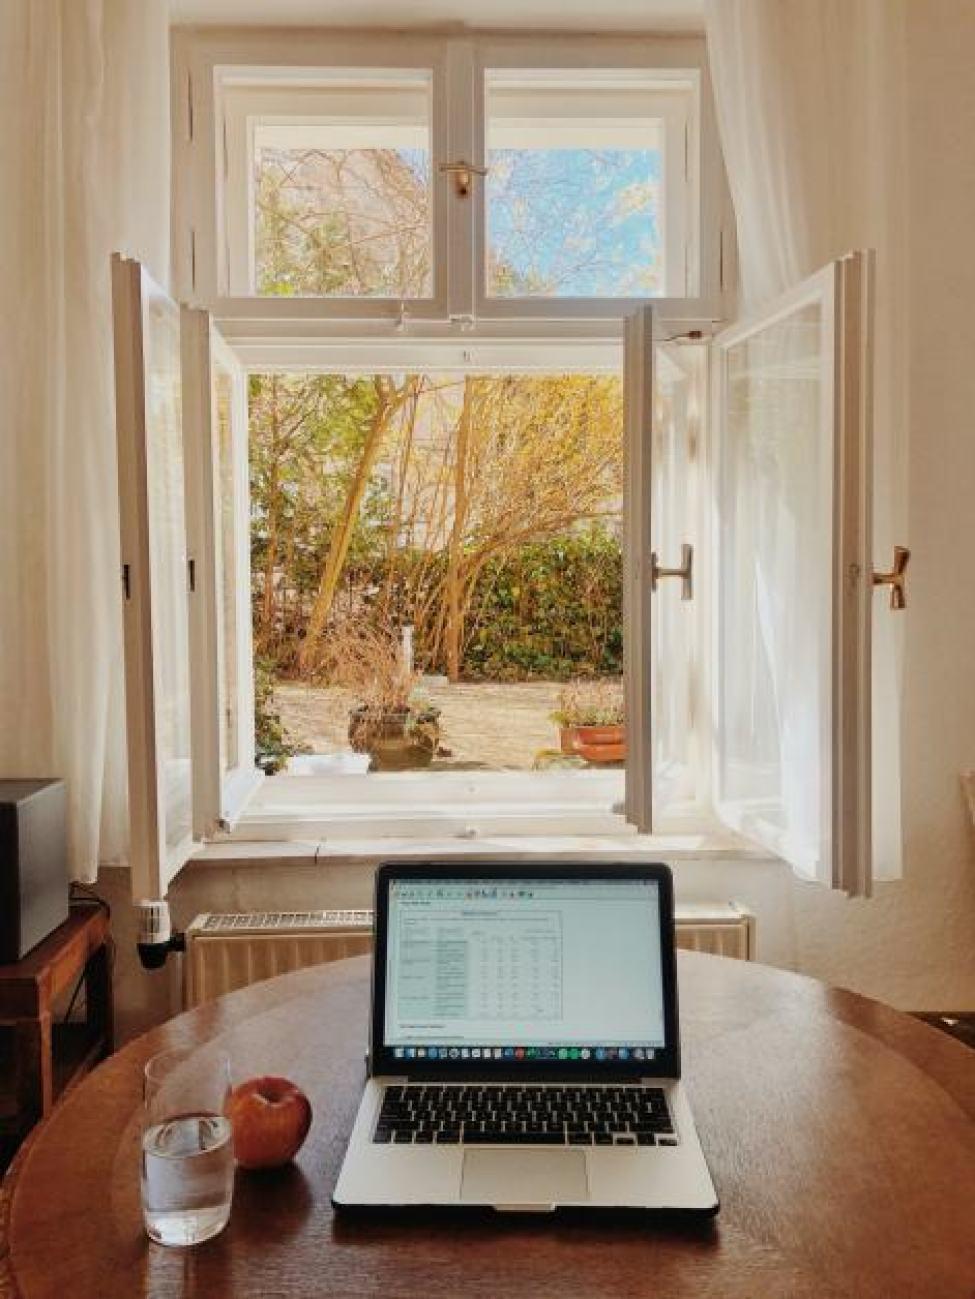 laptop in front of window